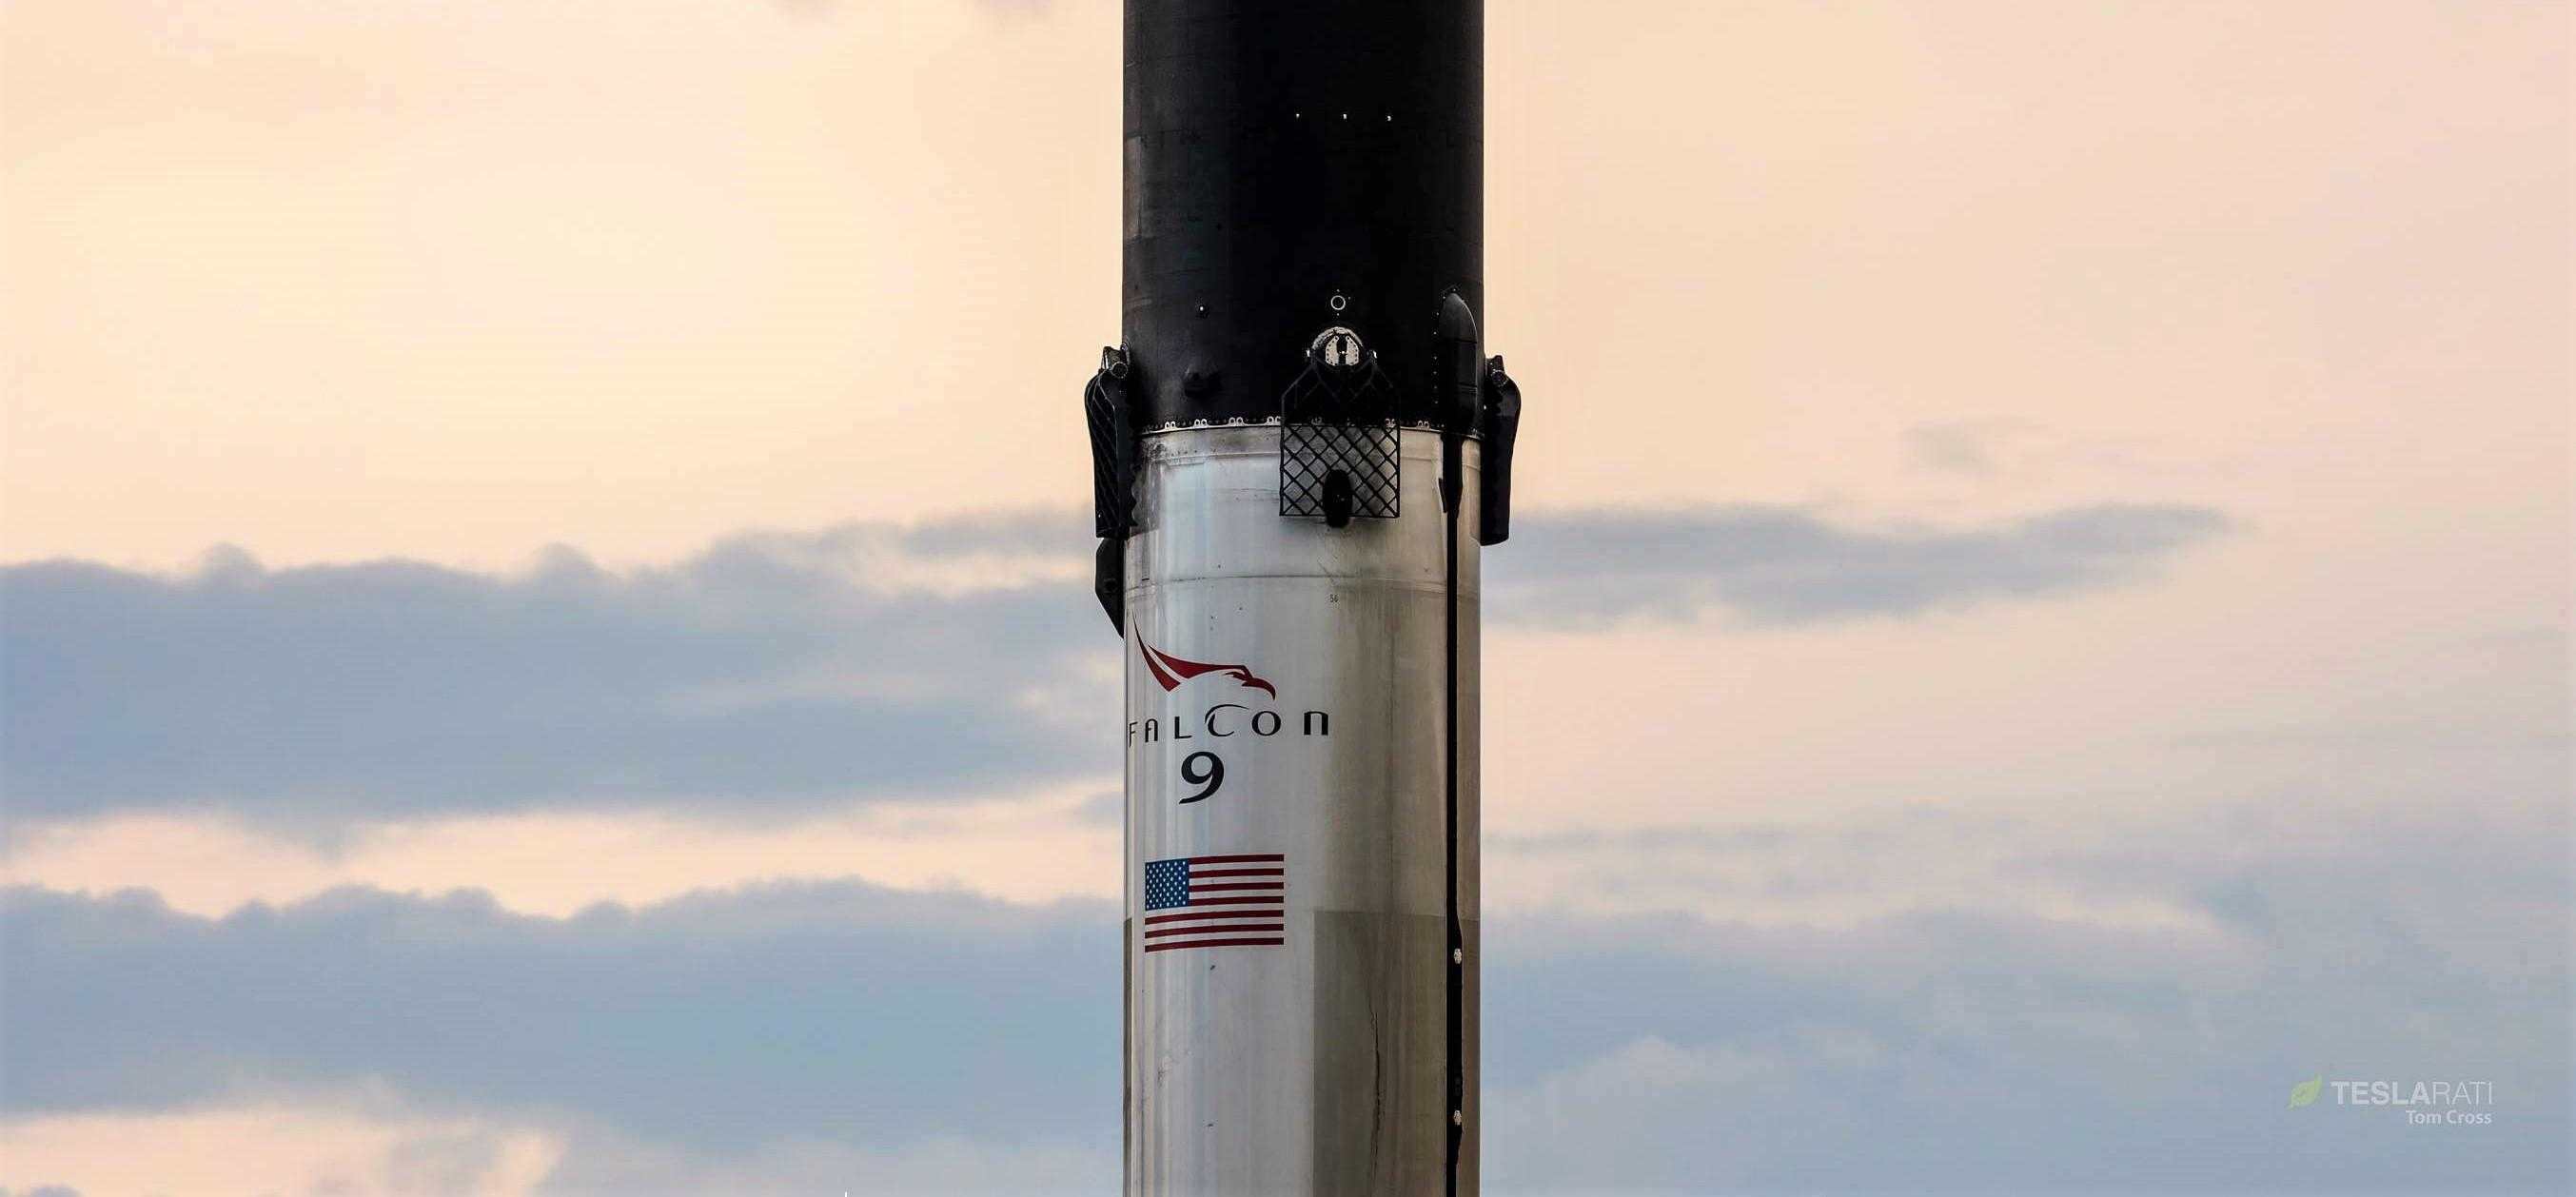 Falcon 9 B1056 CRS-17 Cargo Dragon OCISLY return 050419 (Tom Cross) 6